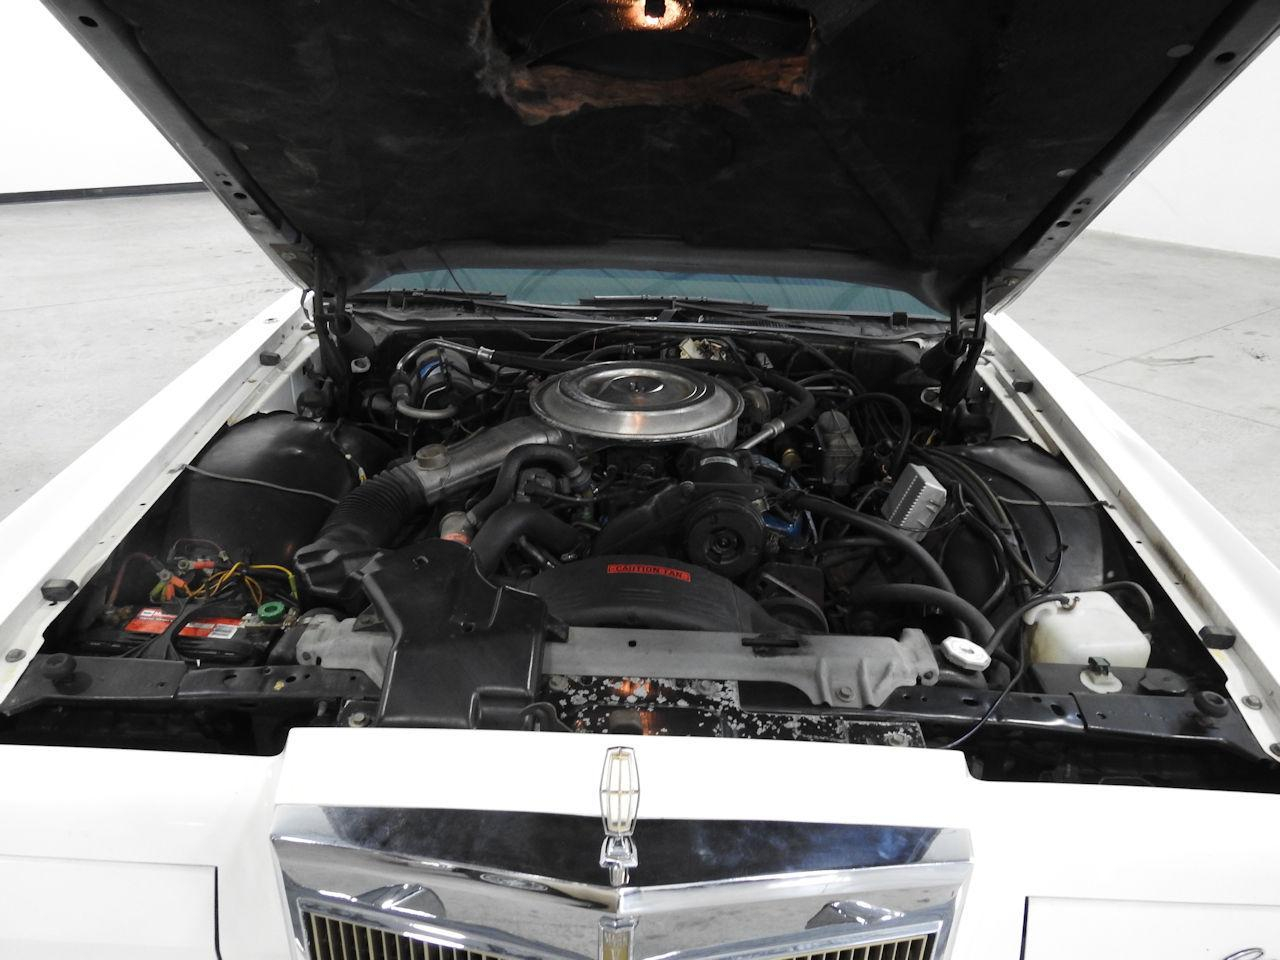 1979 Lincoln MKV 74